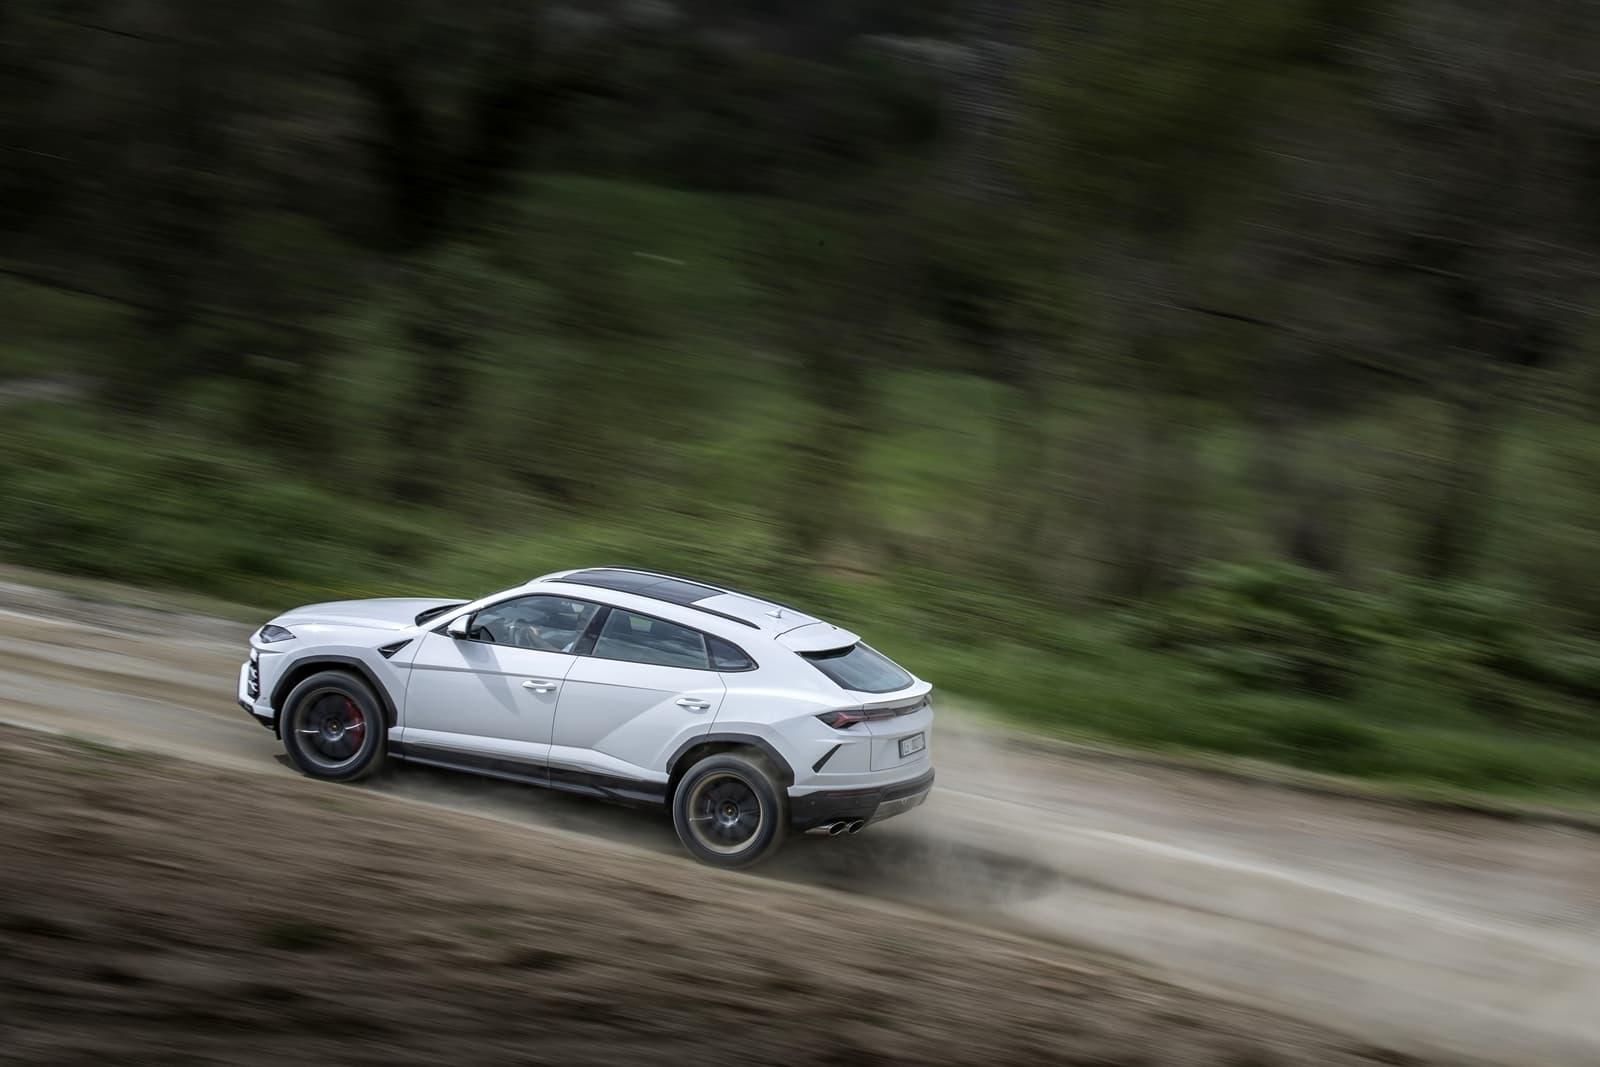 Lamborghini Urus Offroad 0119 005